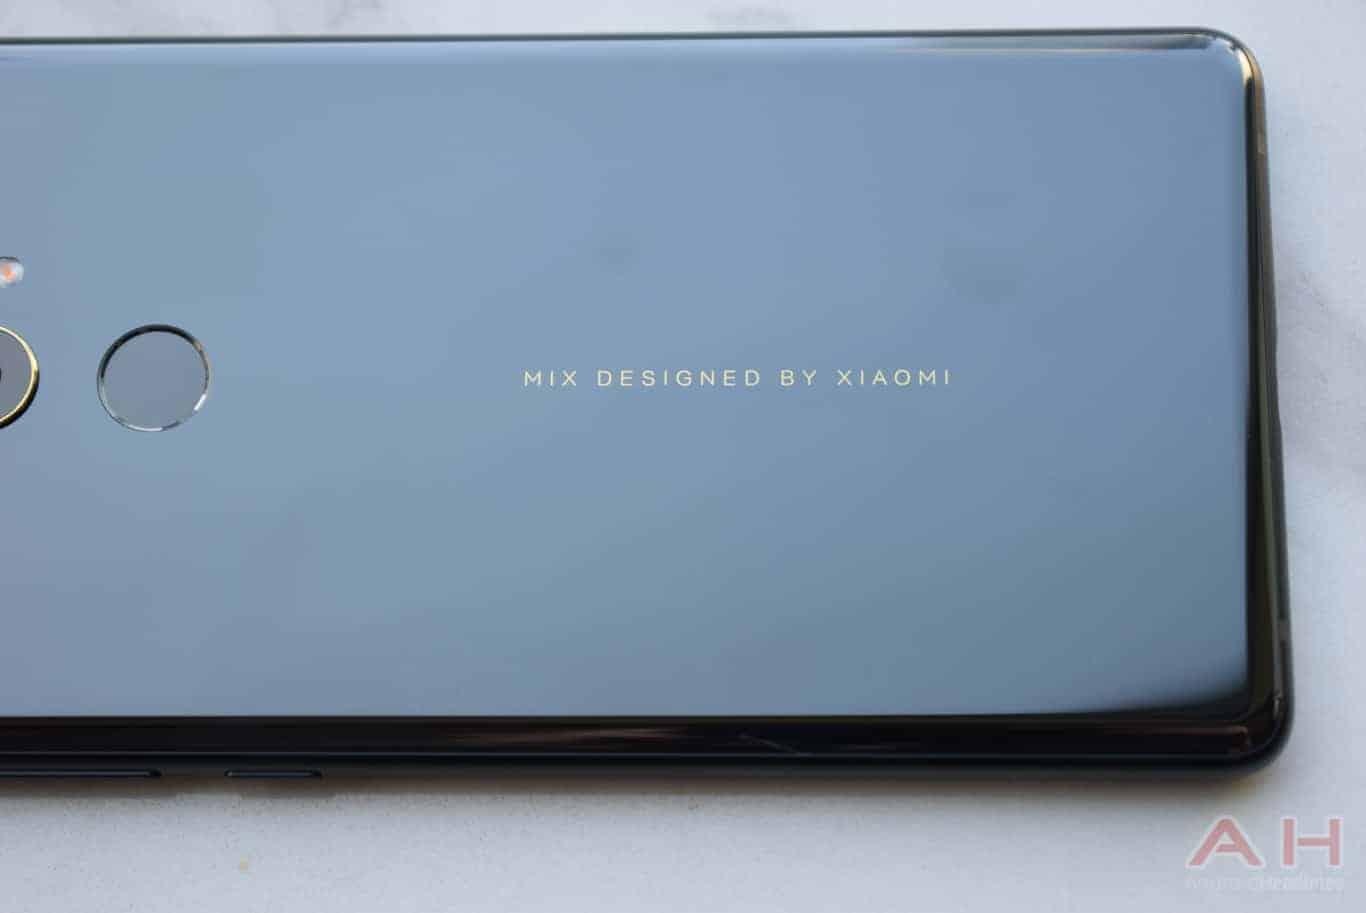 Xiaomi Mi MIX 2 Hands On AM AH 23